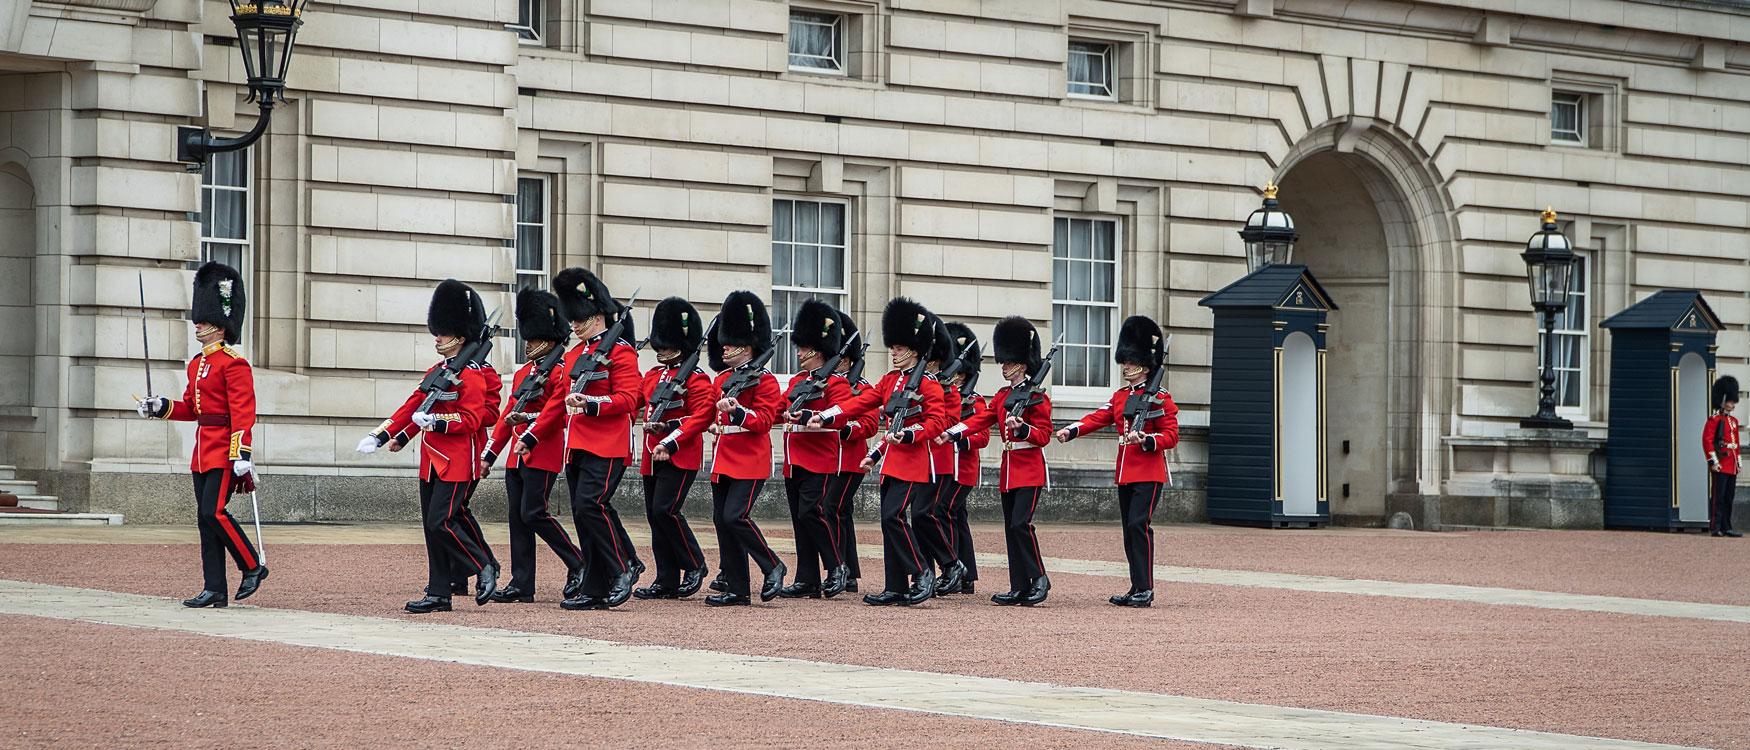 Buckingham Palace Wachablösung London